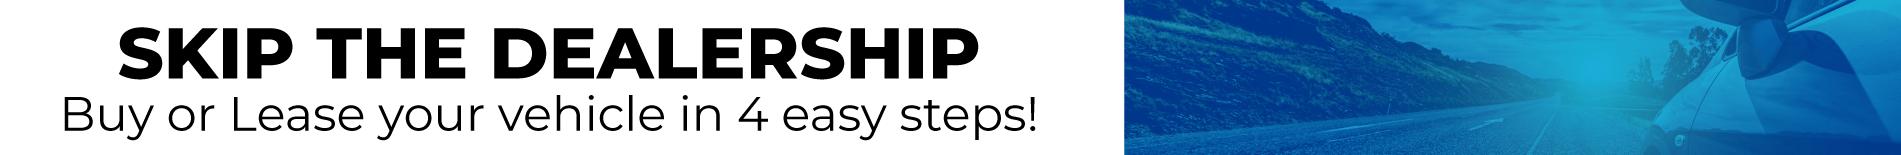 Skip the Dealership/ width=